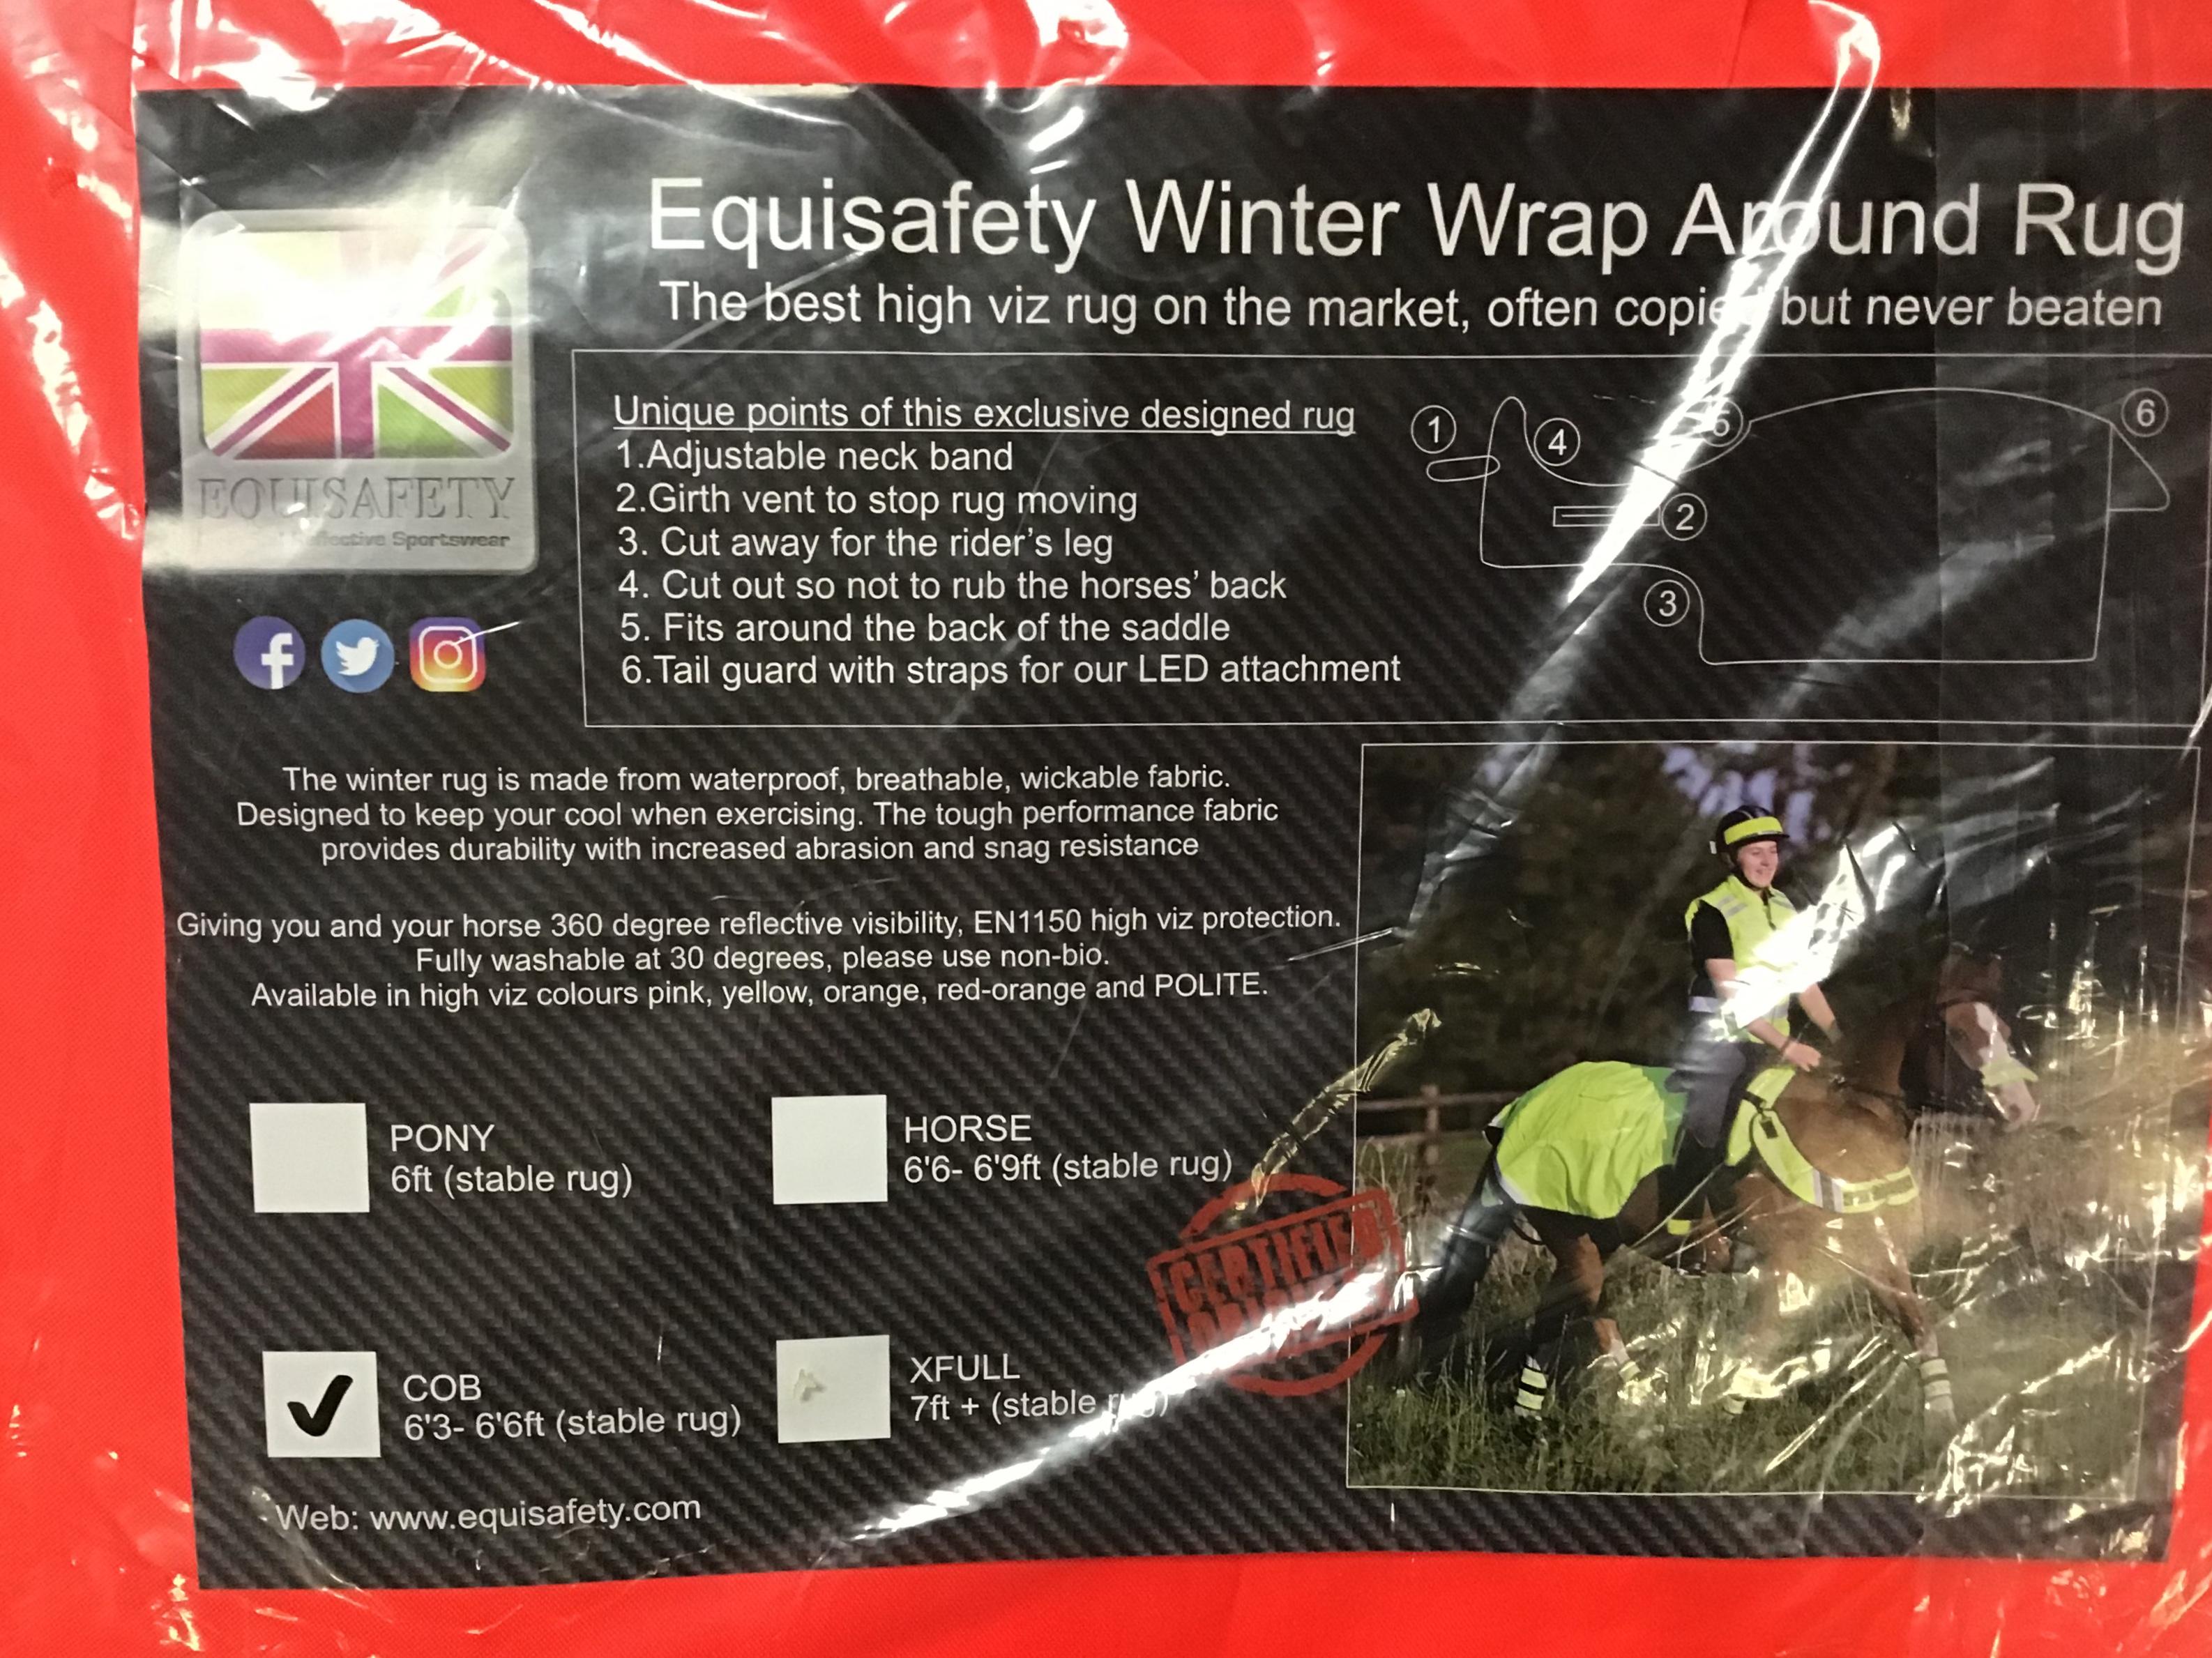 Equisafety Winter Wrap Around Rug